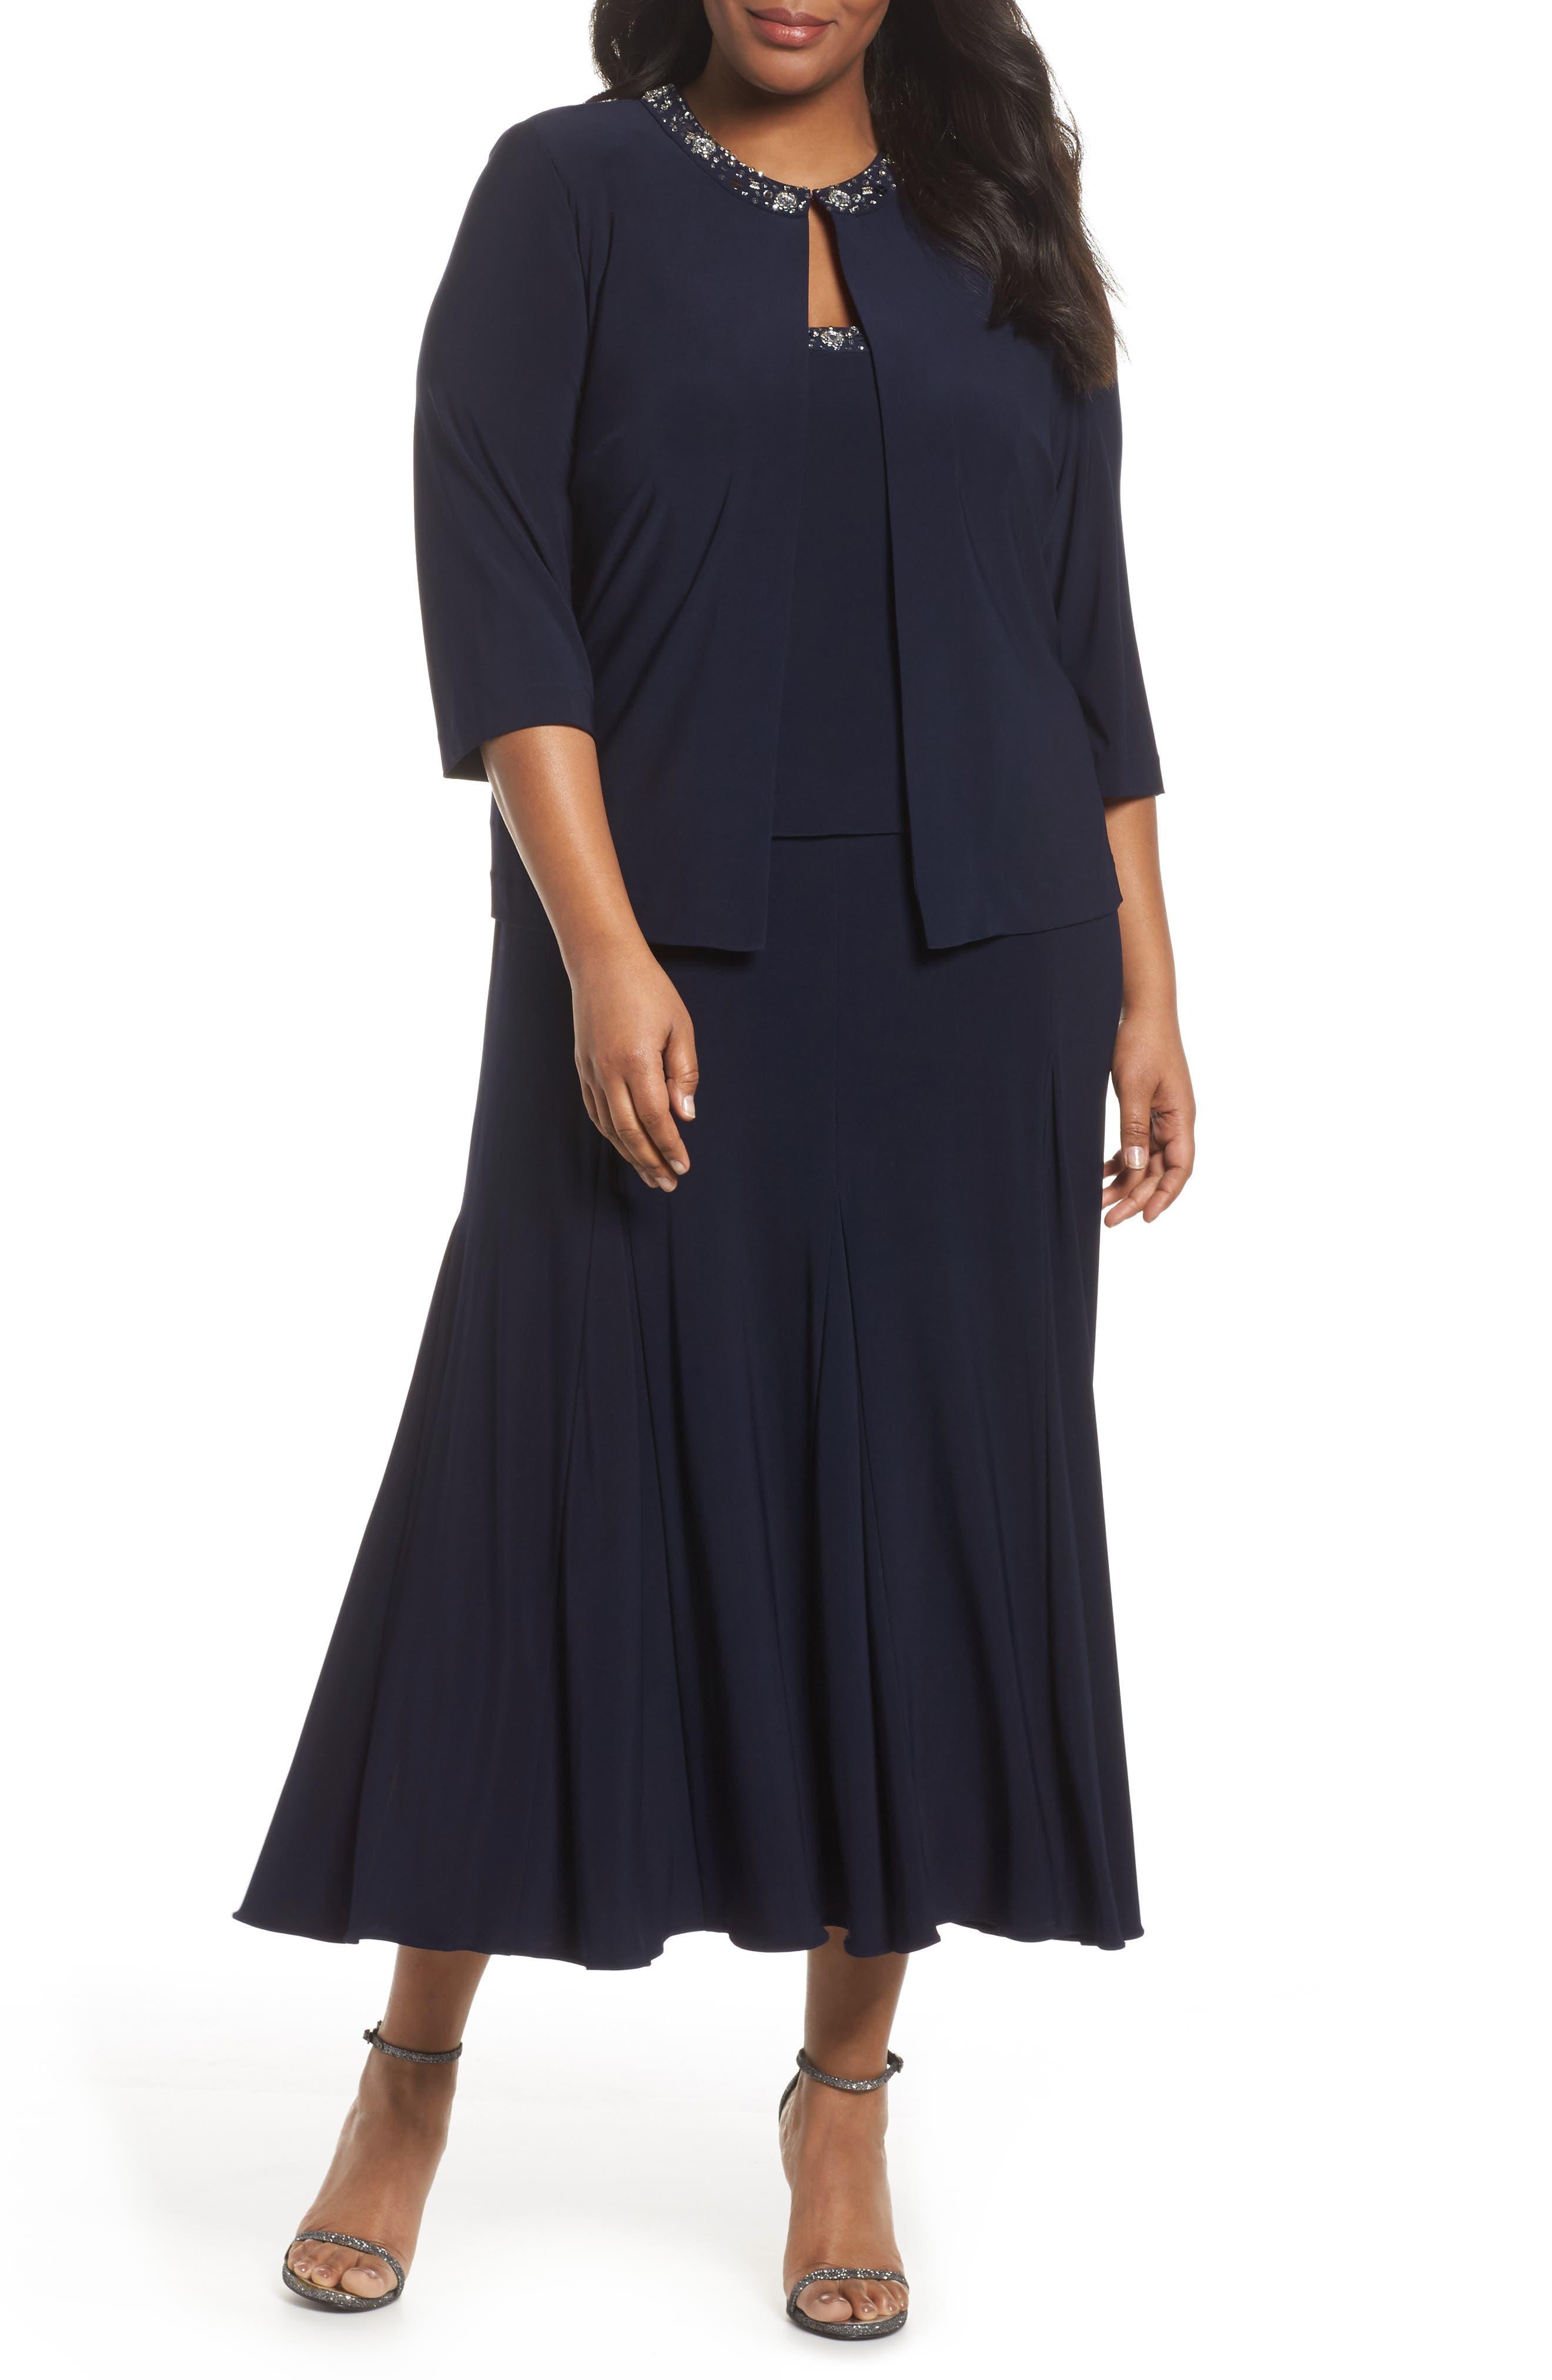 Alternate Image 1 Selected - Alex Evenings Beaded Dress & Jacket (Plus Size)